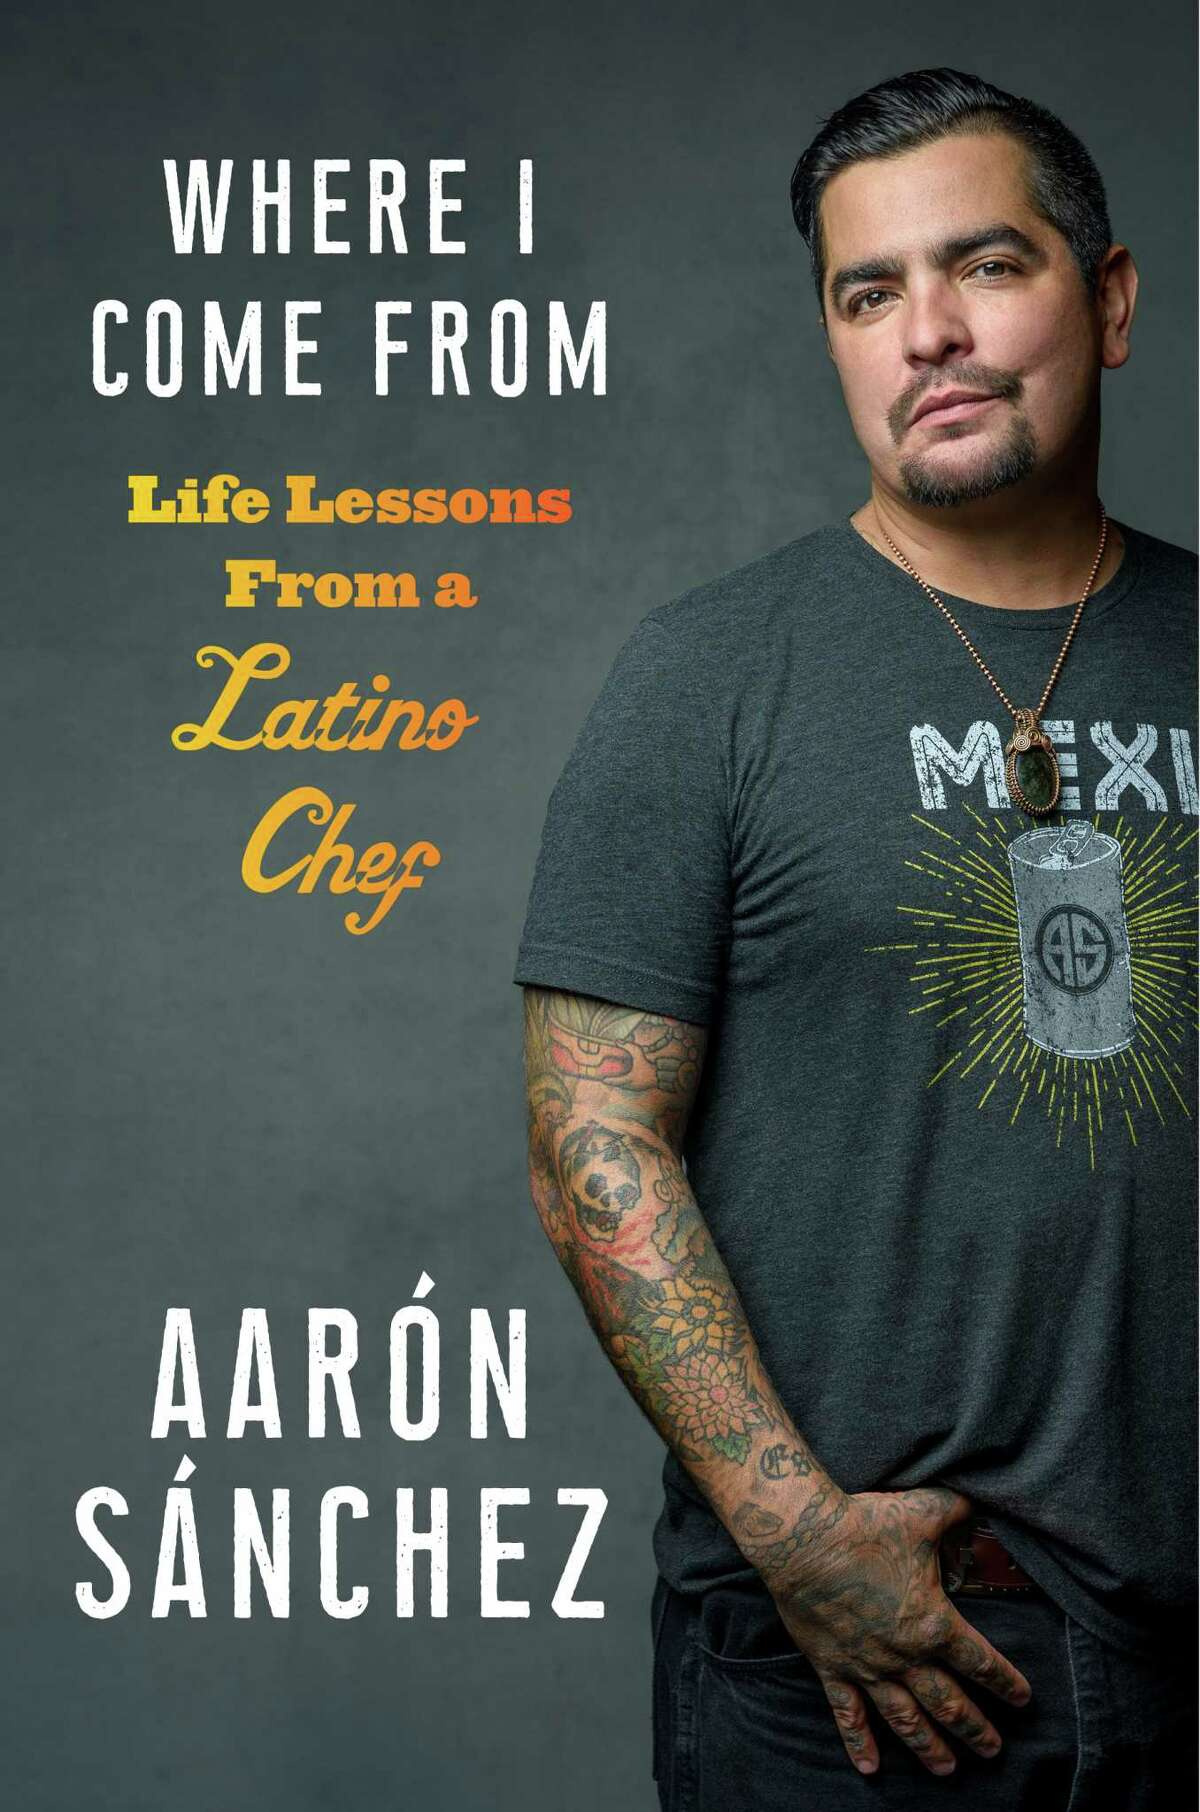 Chef and restaurateur Aaron Sanchez comes to Houston Dec. 5 for his book tour promoting